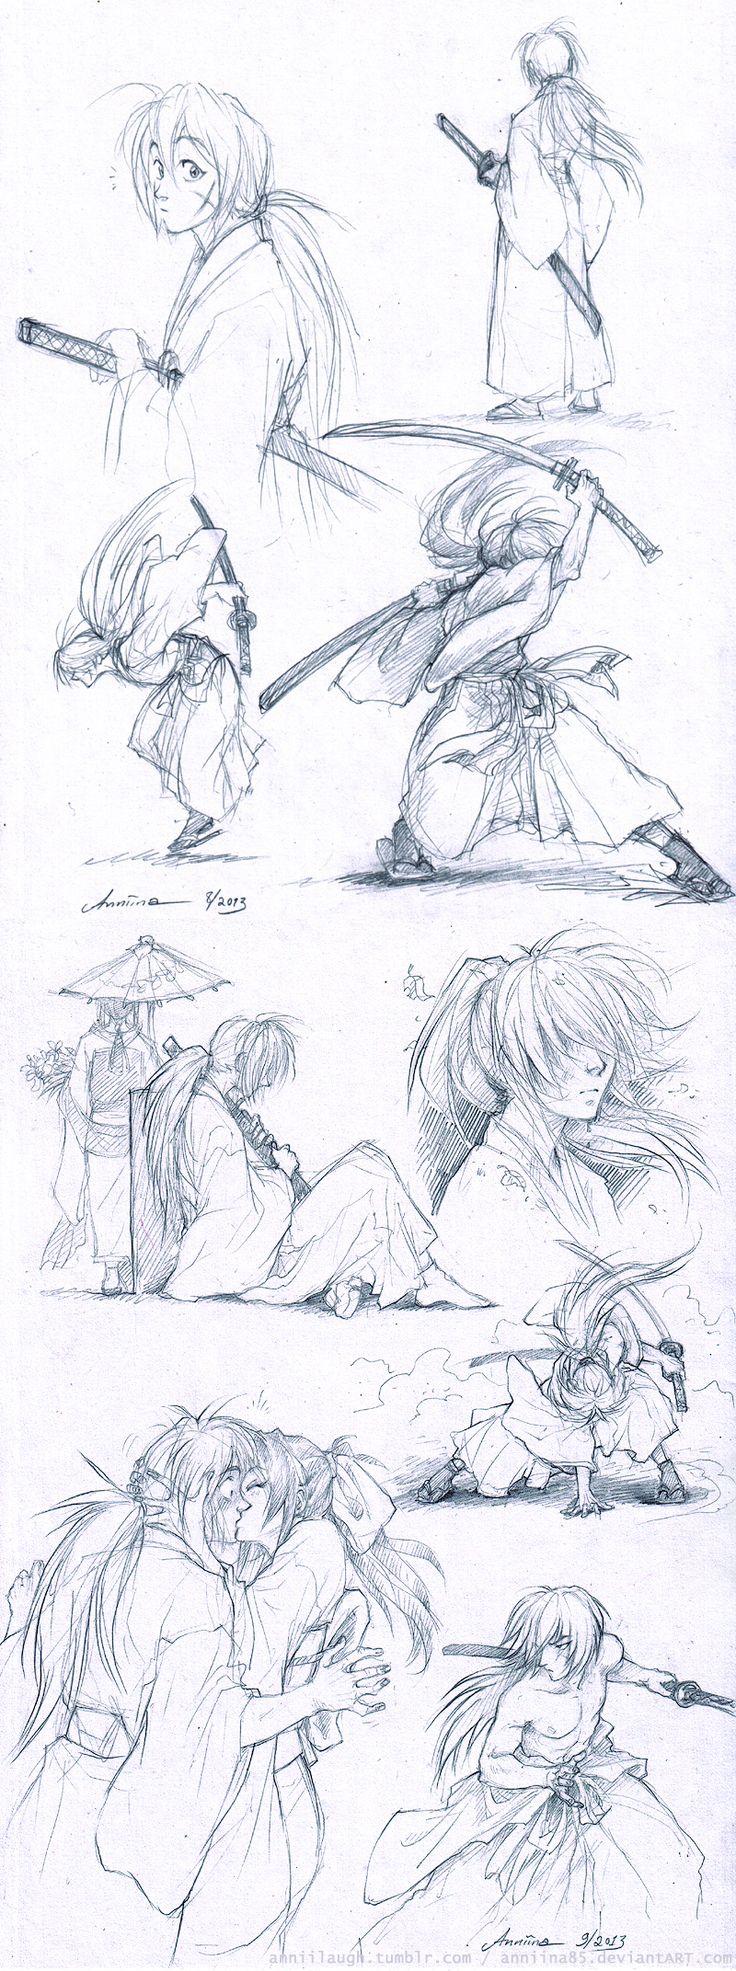 RuroKen sketches by Anniina85.deviantart.com on @deviantART  @aashtrayheart mira que lindoooooooooooo